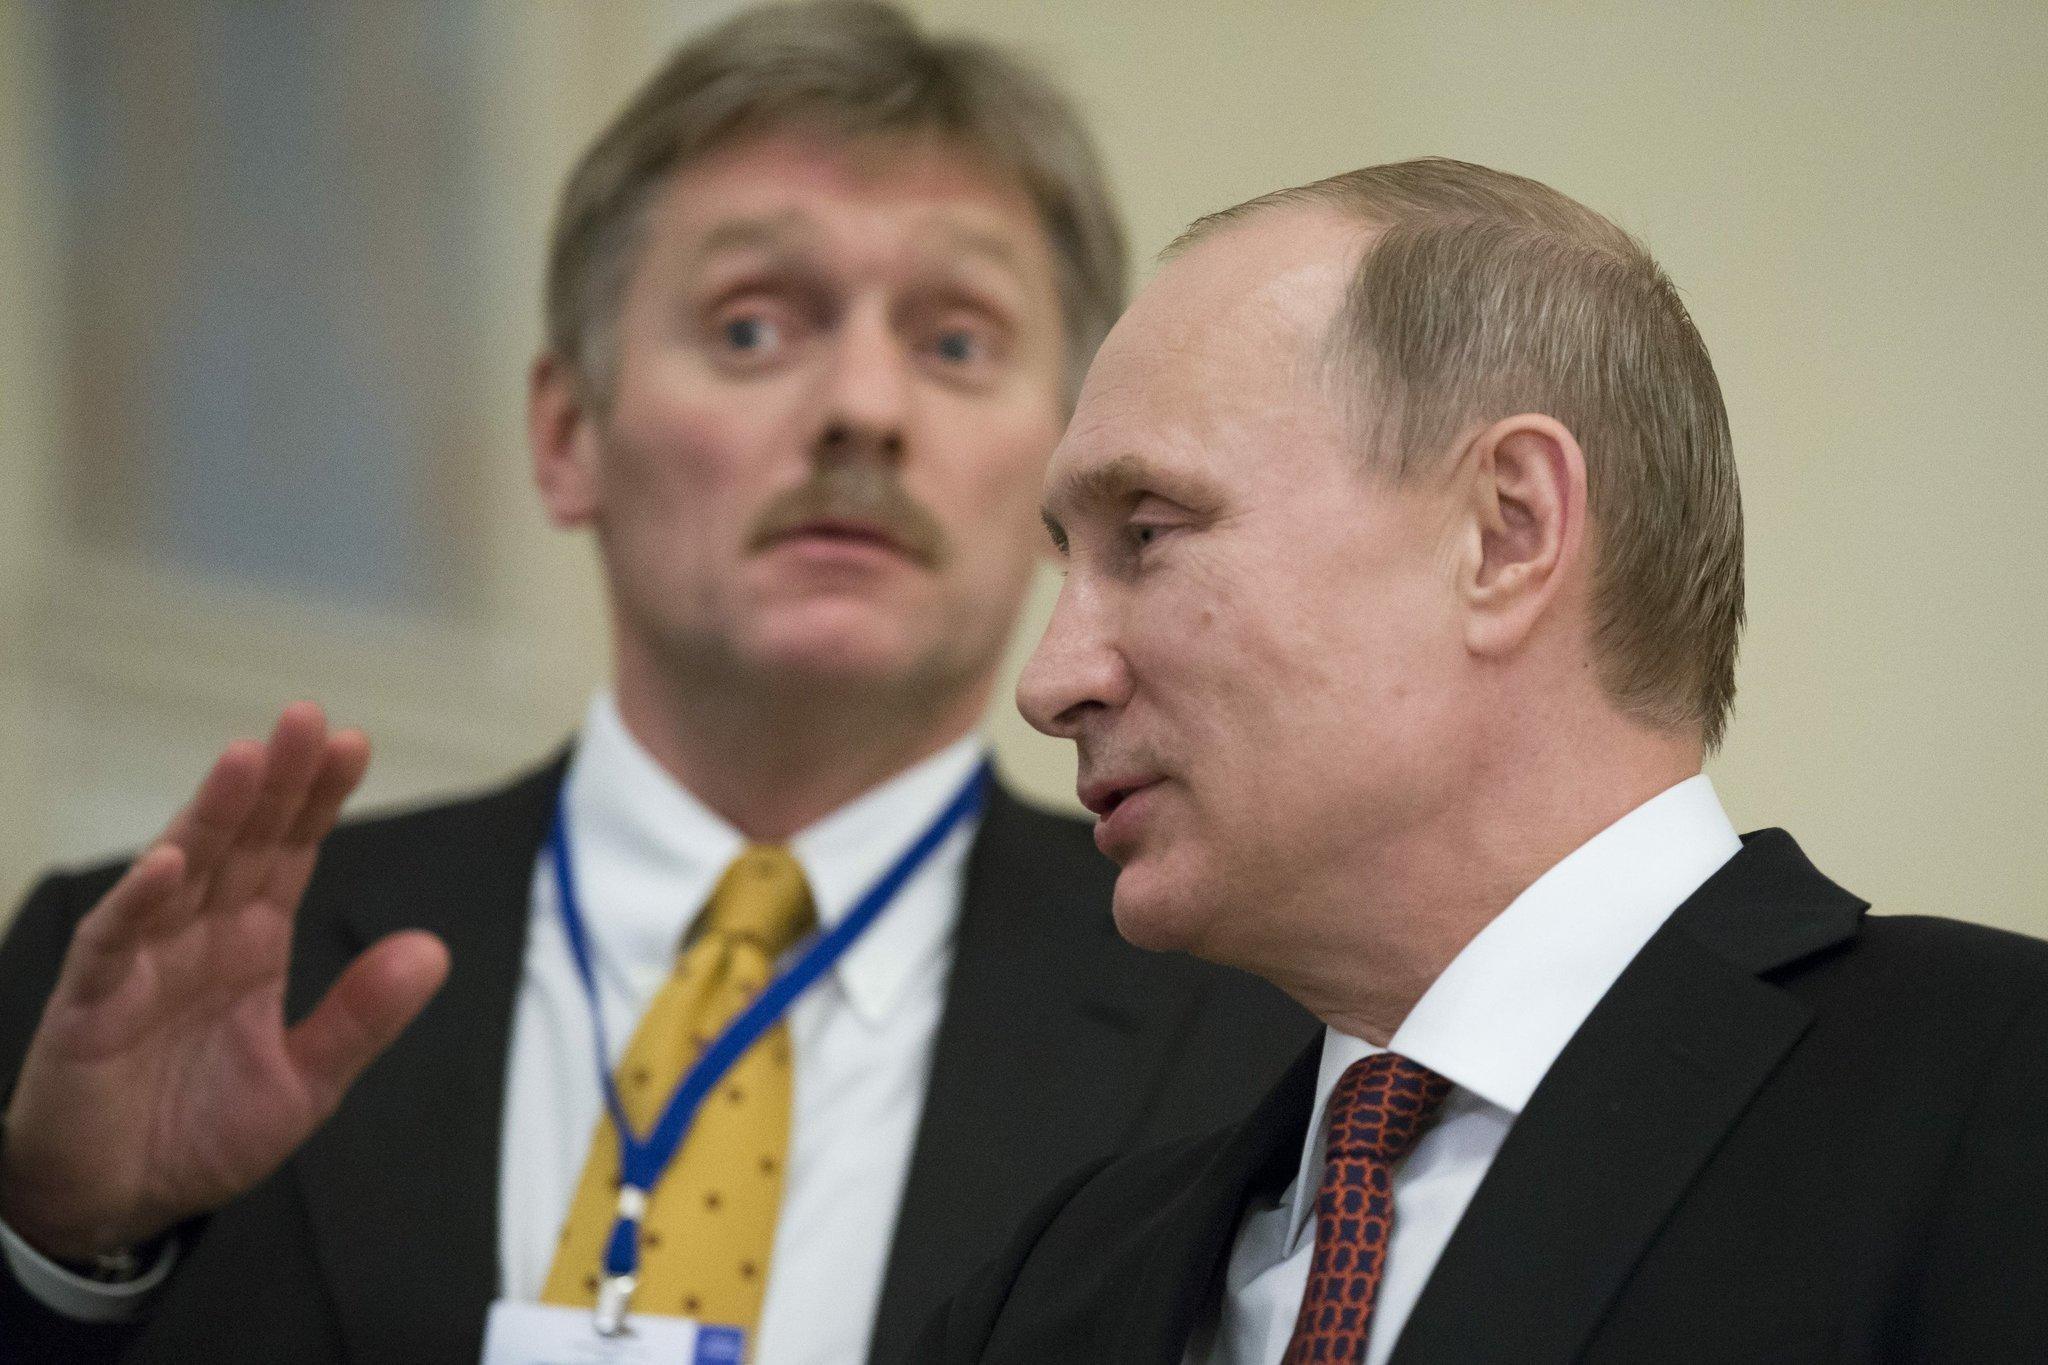 Dmitry Peskov: Putin is healthy, but very busy working 03/12/2015